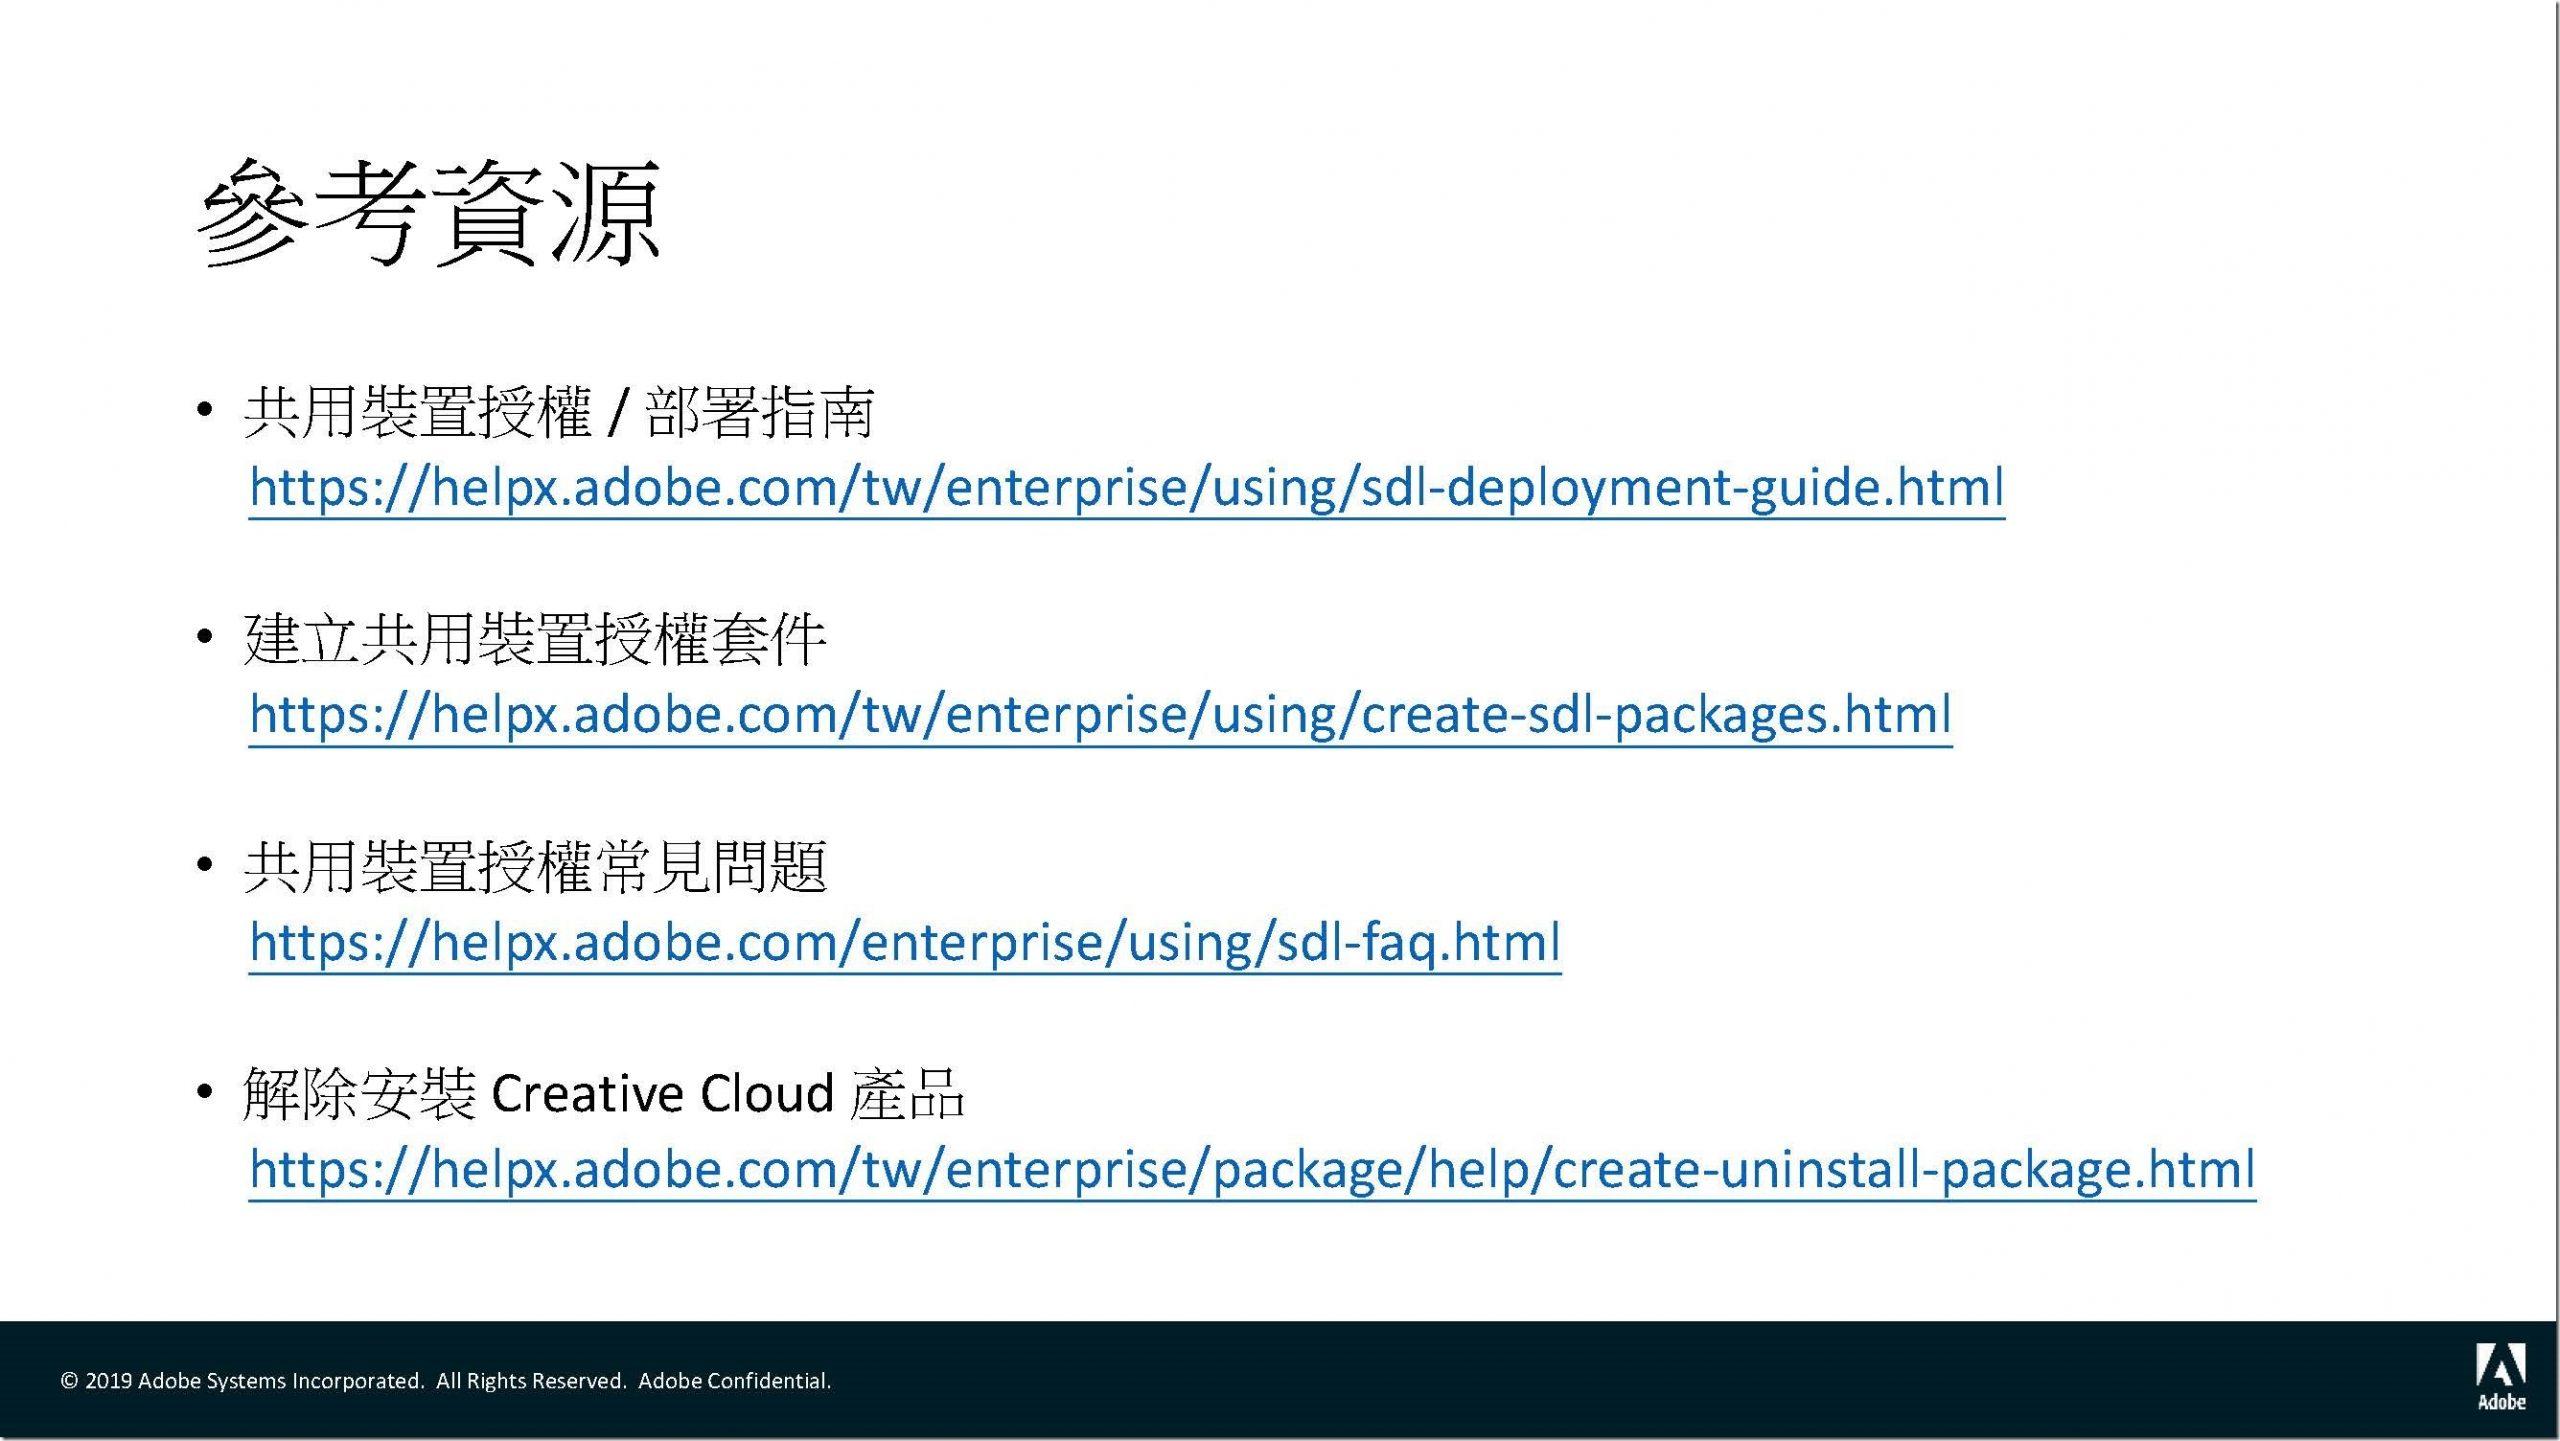 Adobe 共用裝置授權安裝指南_教育通用_頁面_35